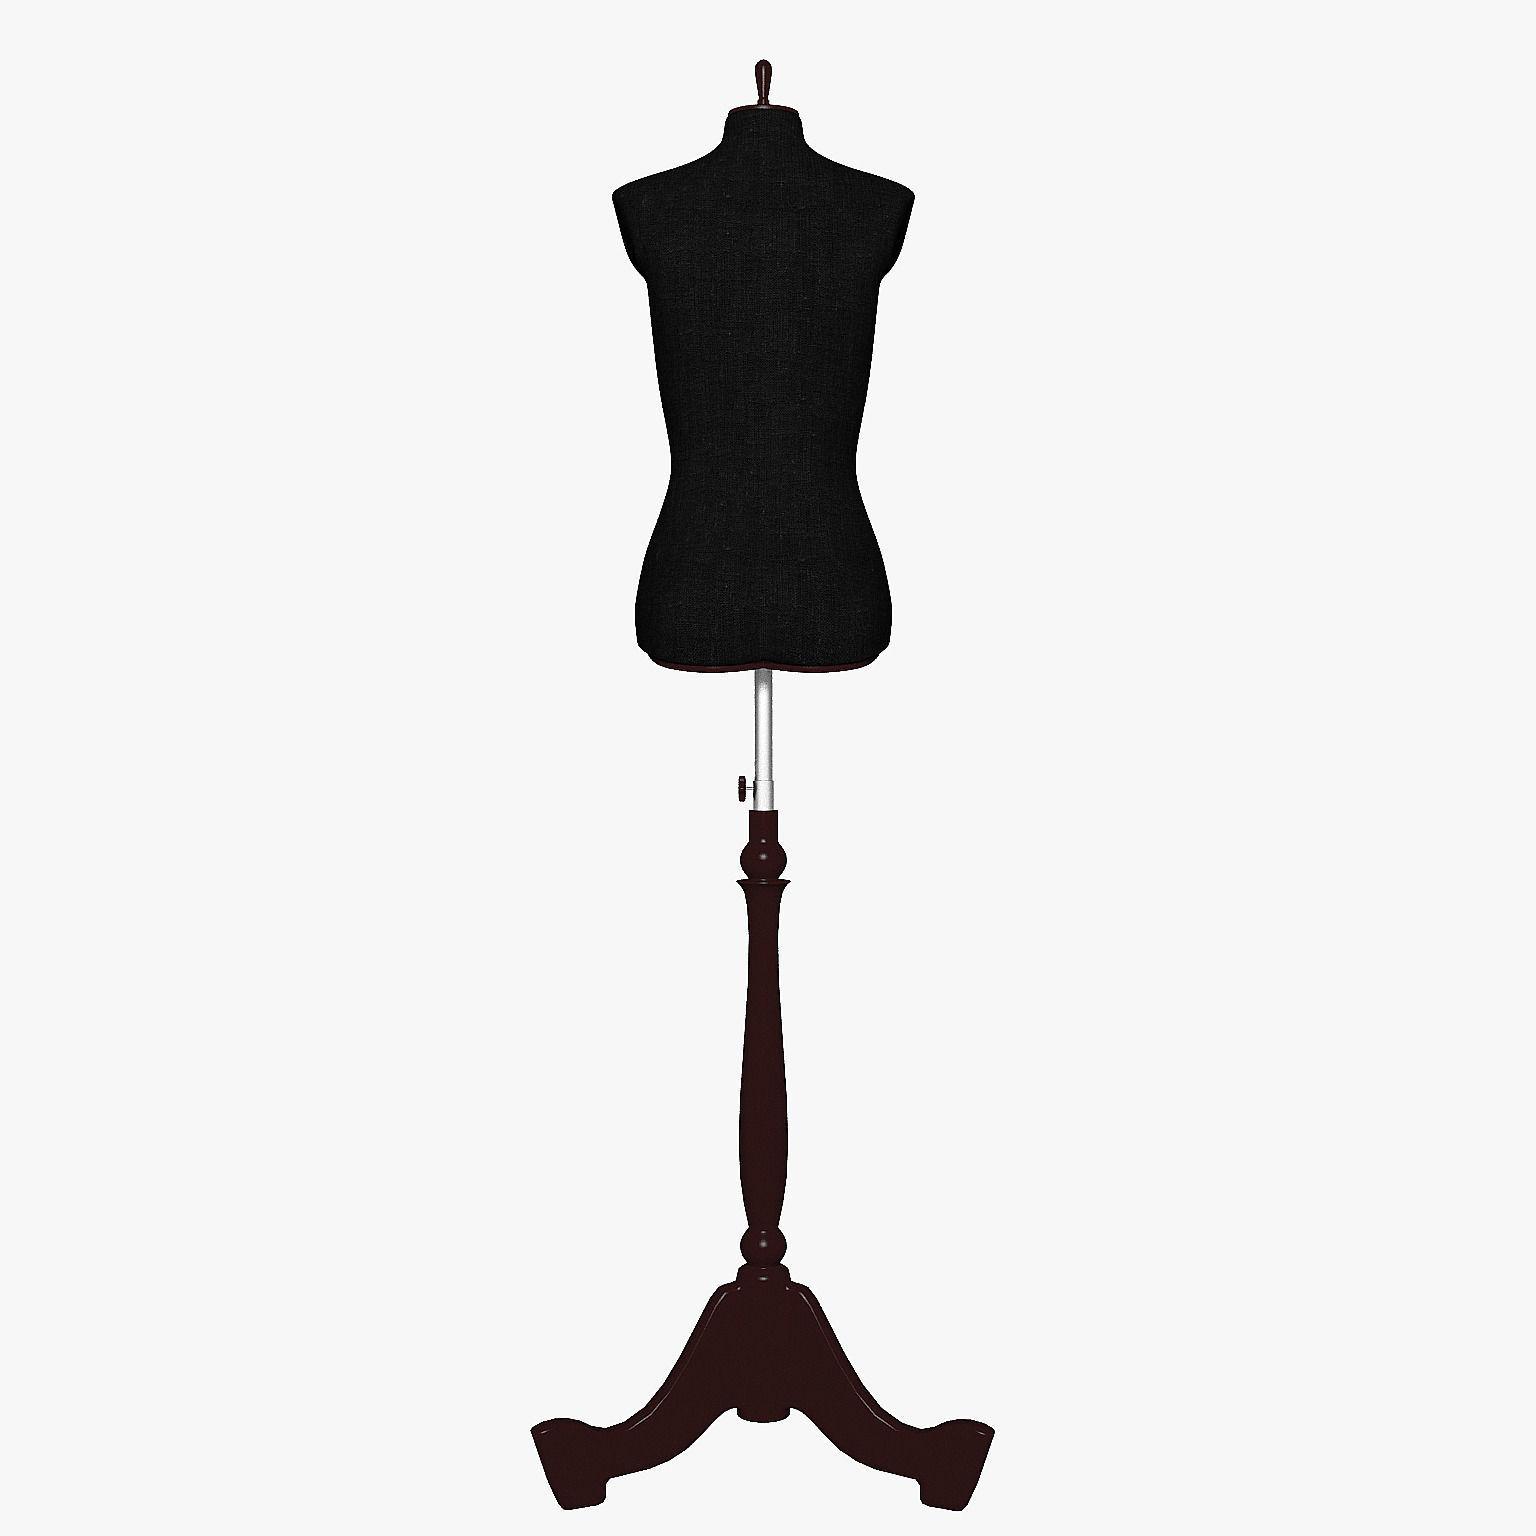 mannequin chair stand buy ski lift the female 3d model max obj 3ds fbx